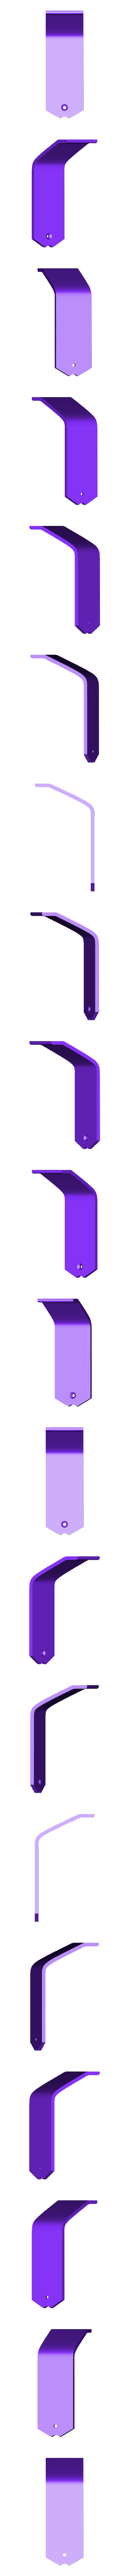 arm.stl Download free STL file Anycubic Kossel 608 Bearing Top Spool Holder • 3D printable model, VICLER